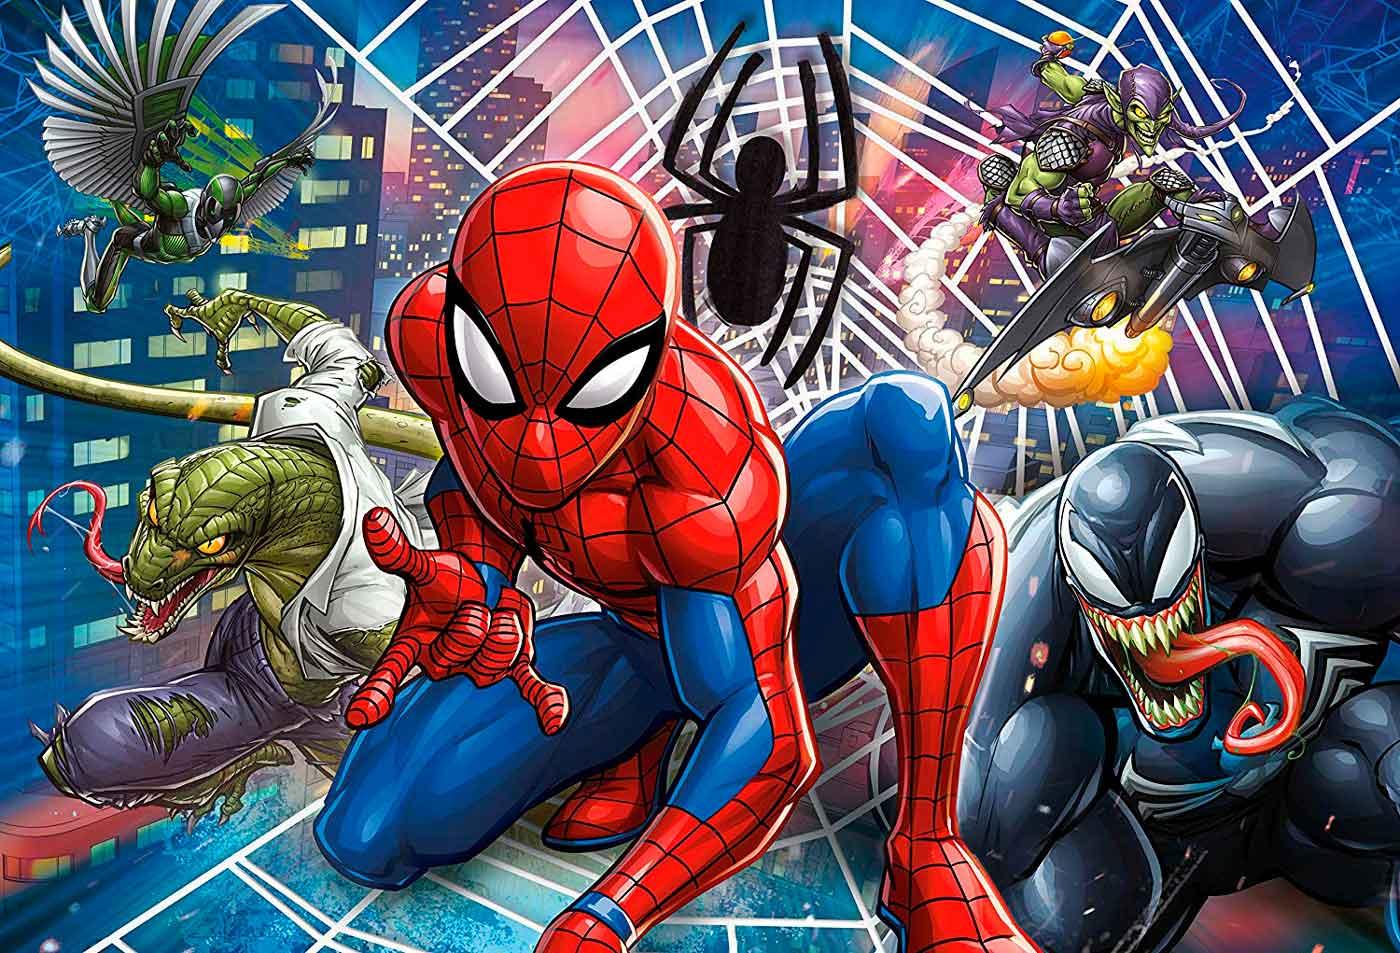 Puzzle Clementoni Spiderman Maxi 60 Piezas